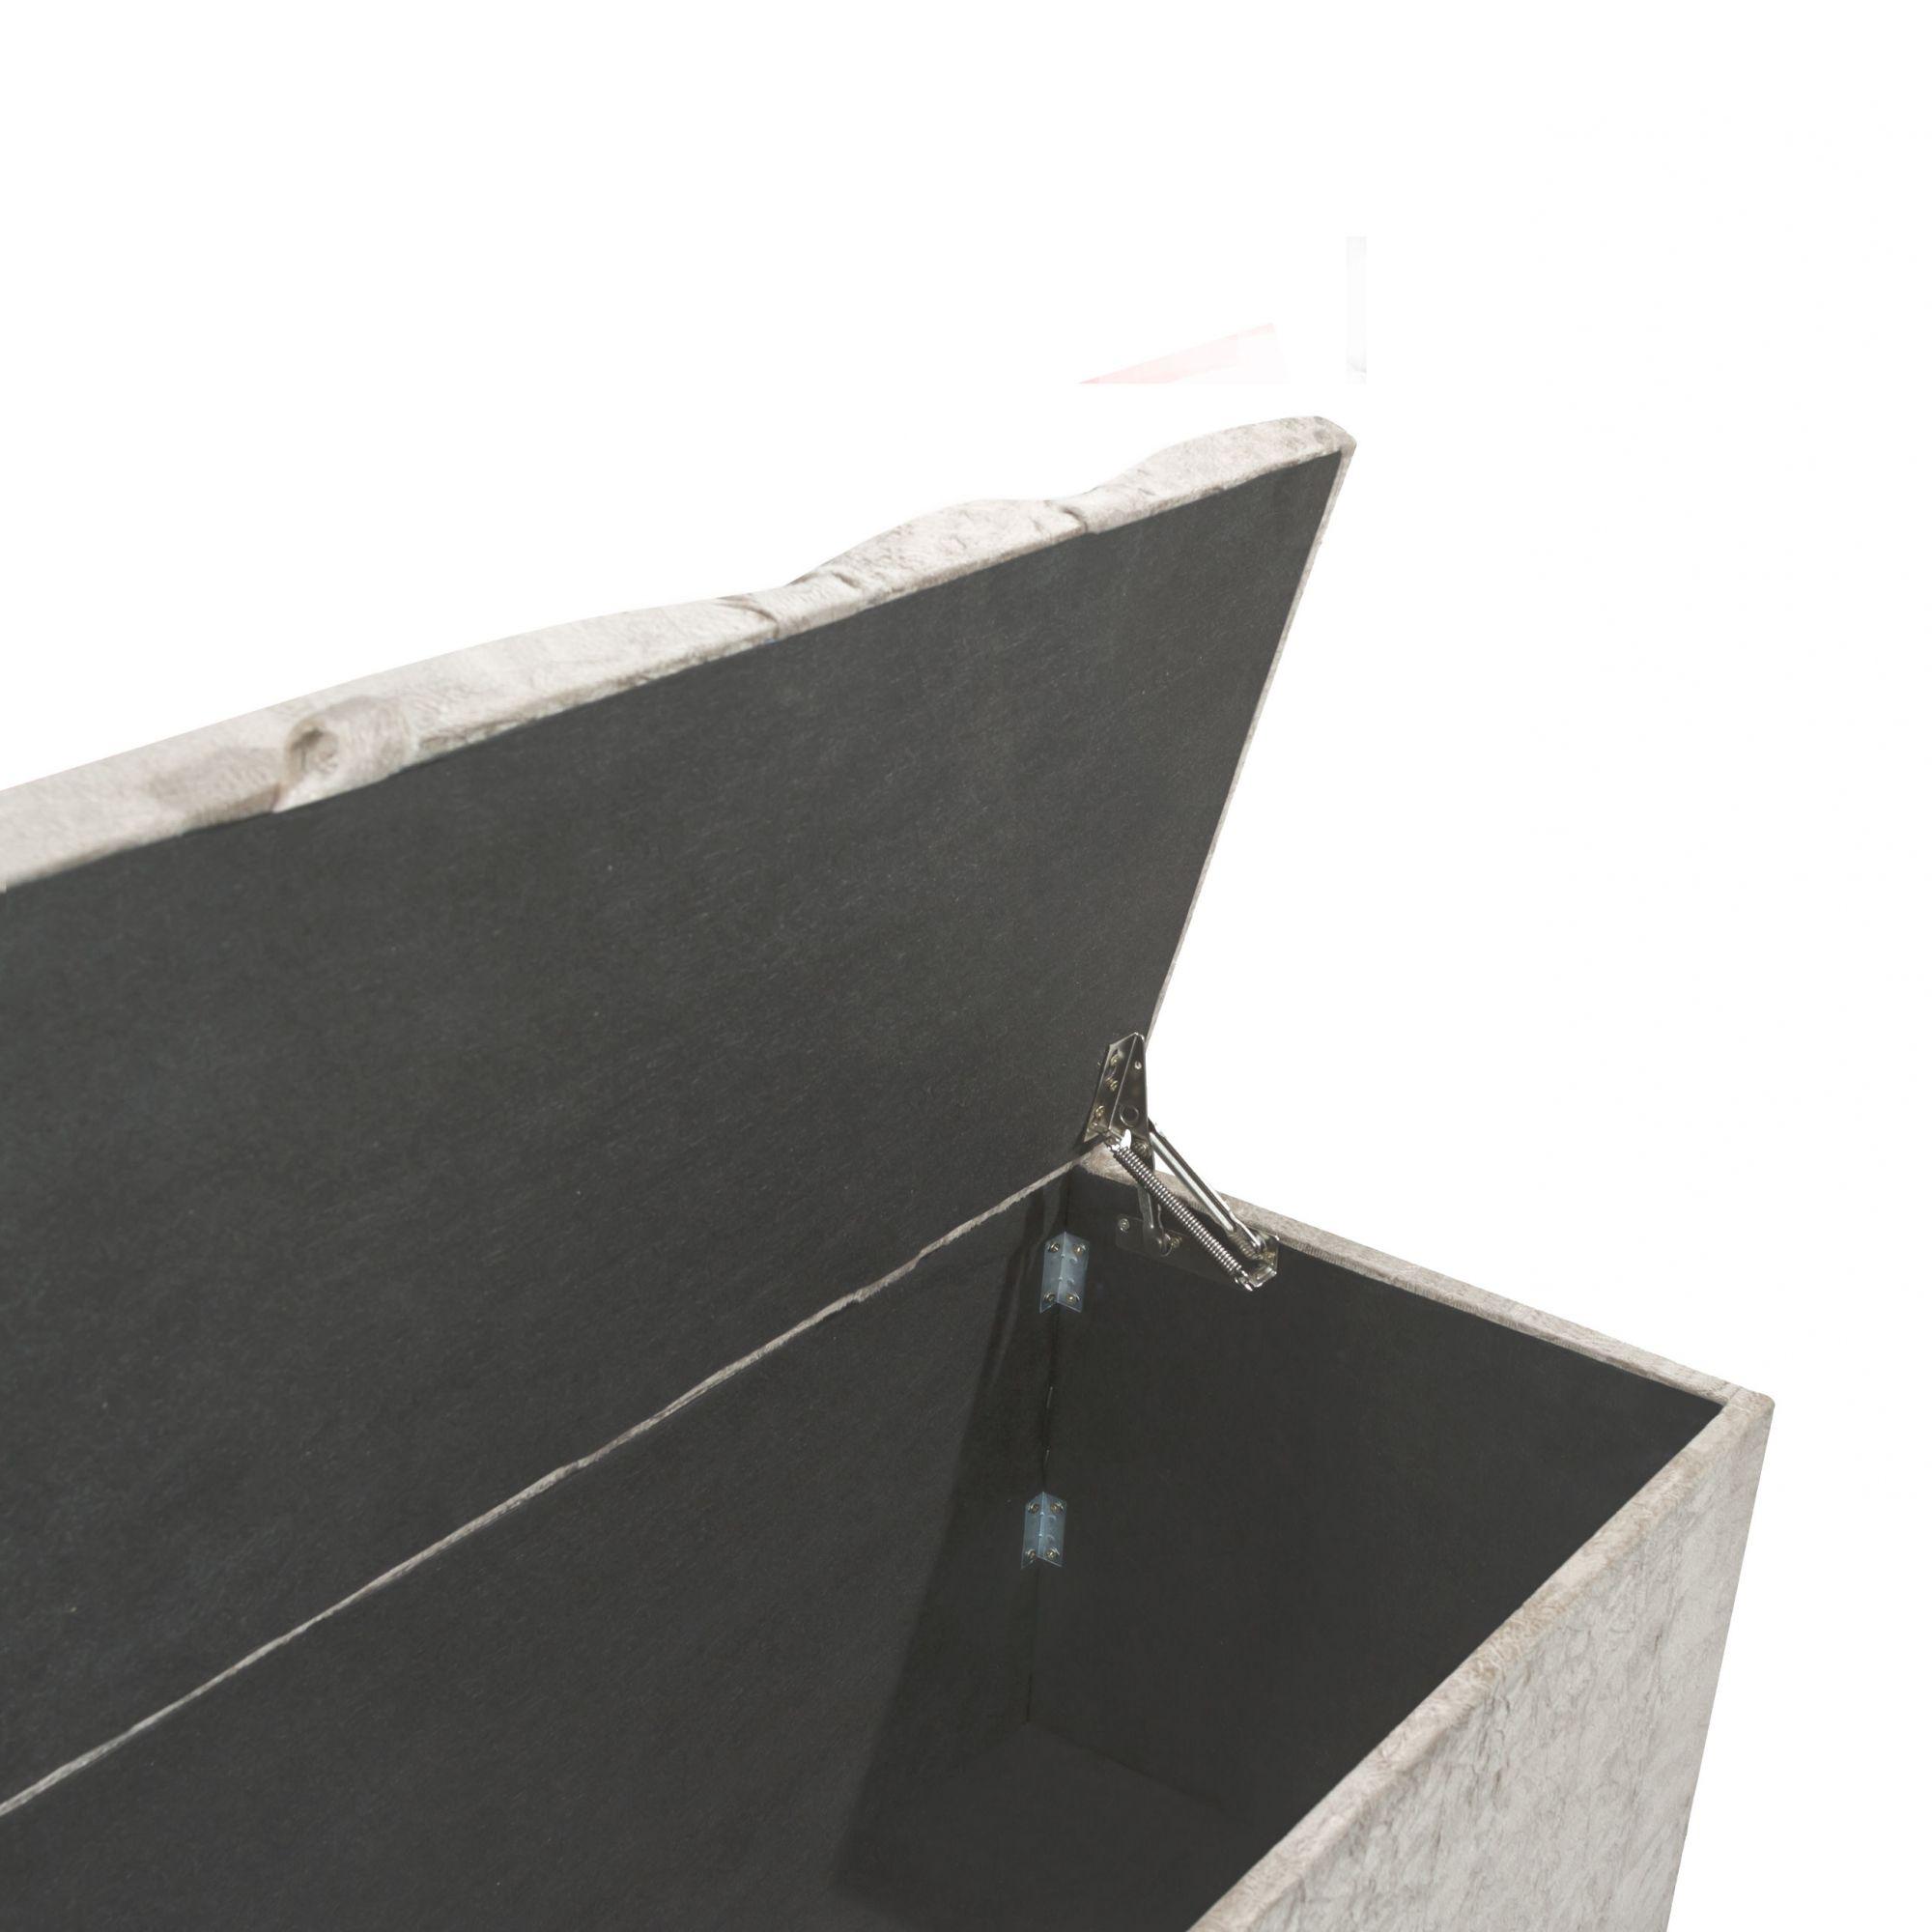 Cabeceira Box Queen com Recamier Tokyo 1.6 Suede Cinza - R.A Estofados